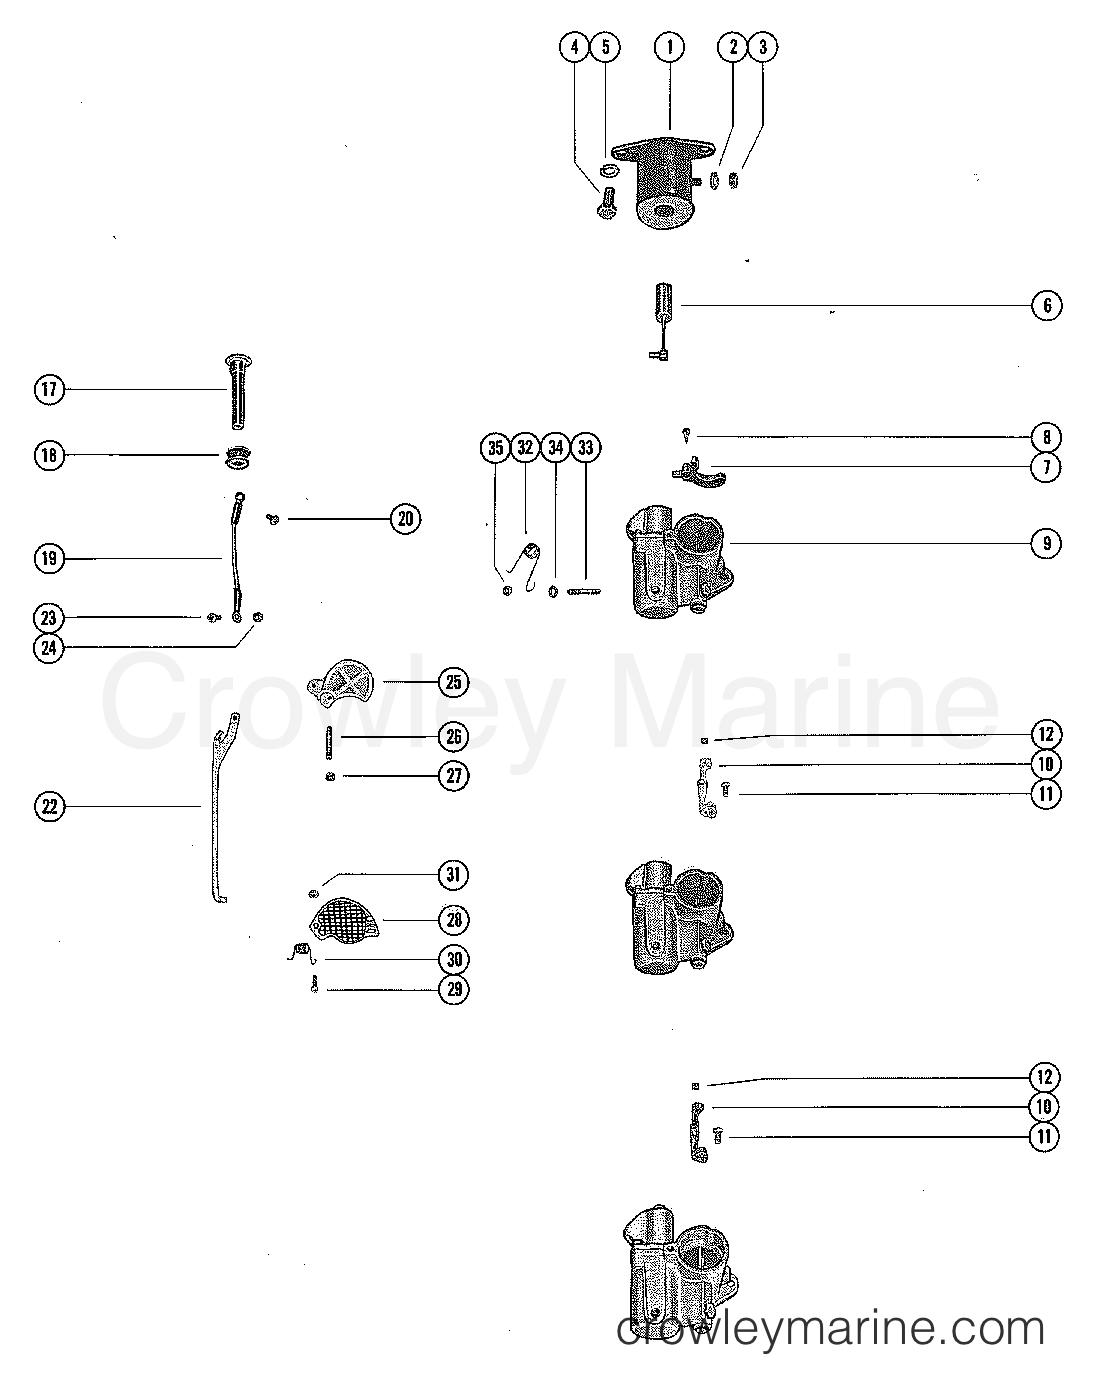 diagram of 1978 mercury marine mercury outboard 1115628 carburetordiagram of 1978 mercury marine mercury outboard 1115628 carburetor